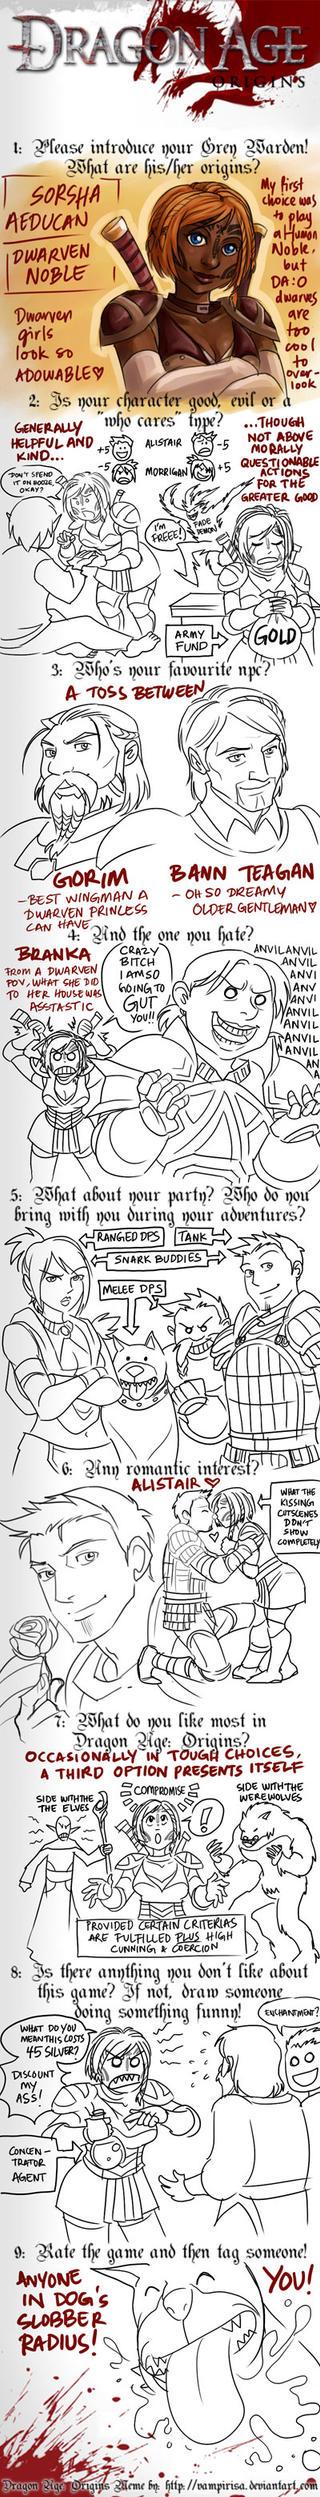 Dragon Age: Origins MeMe by aimo